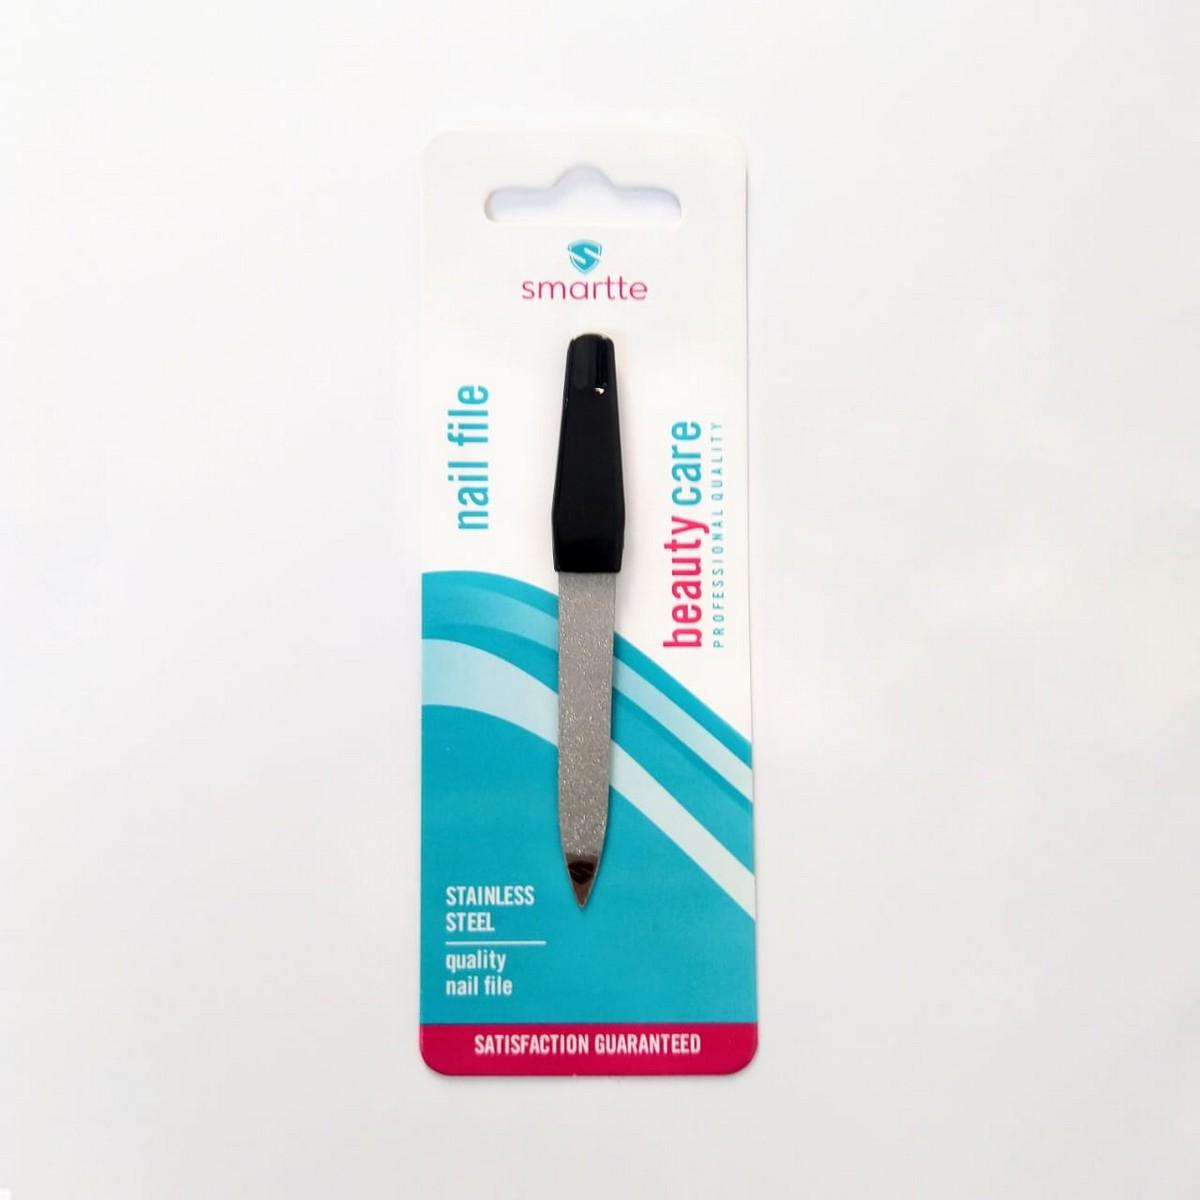 SMARTTE Compact Nail File